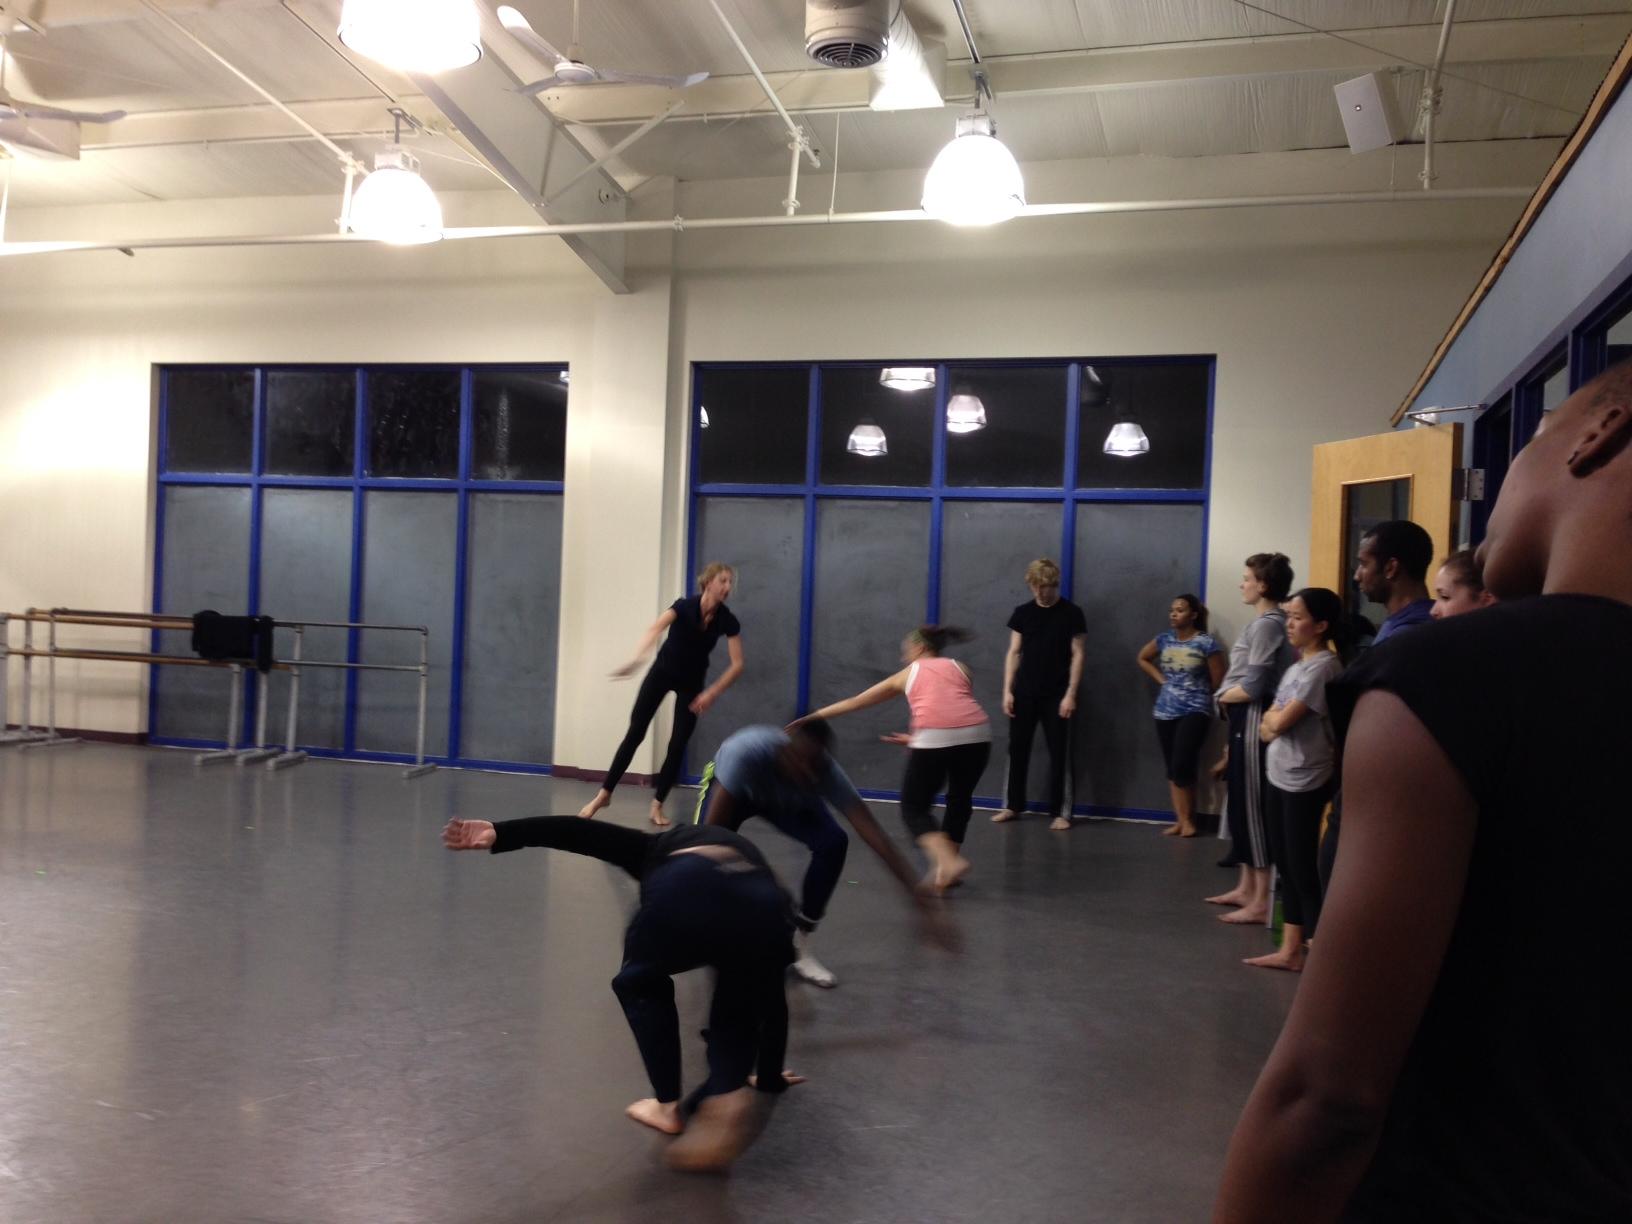 adult dance classes birmingham al